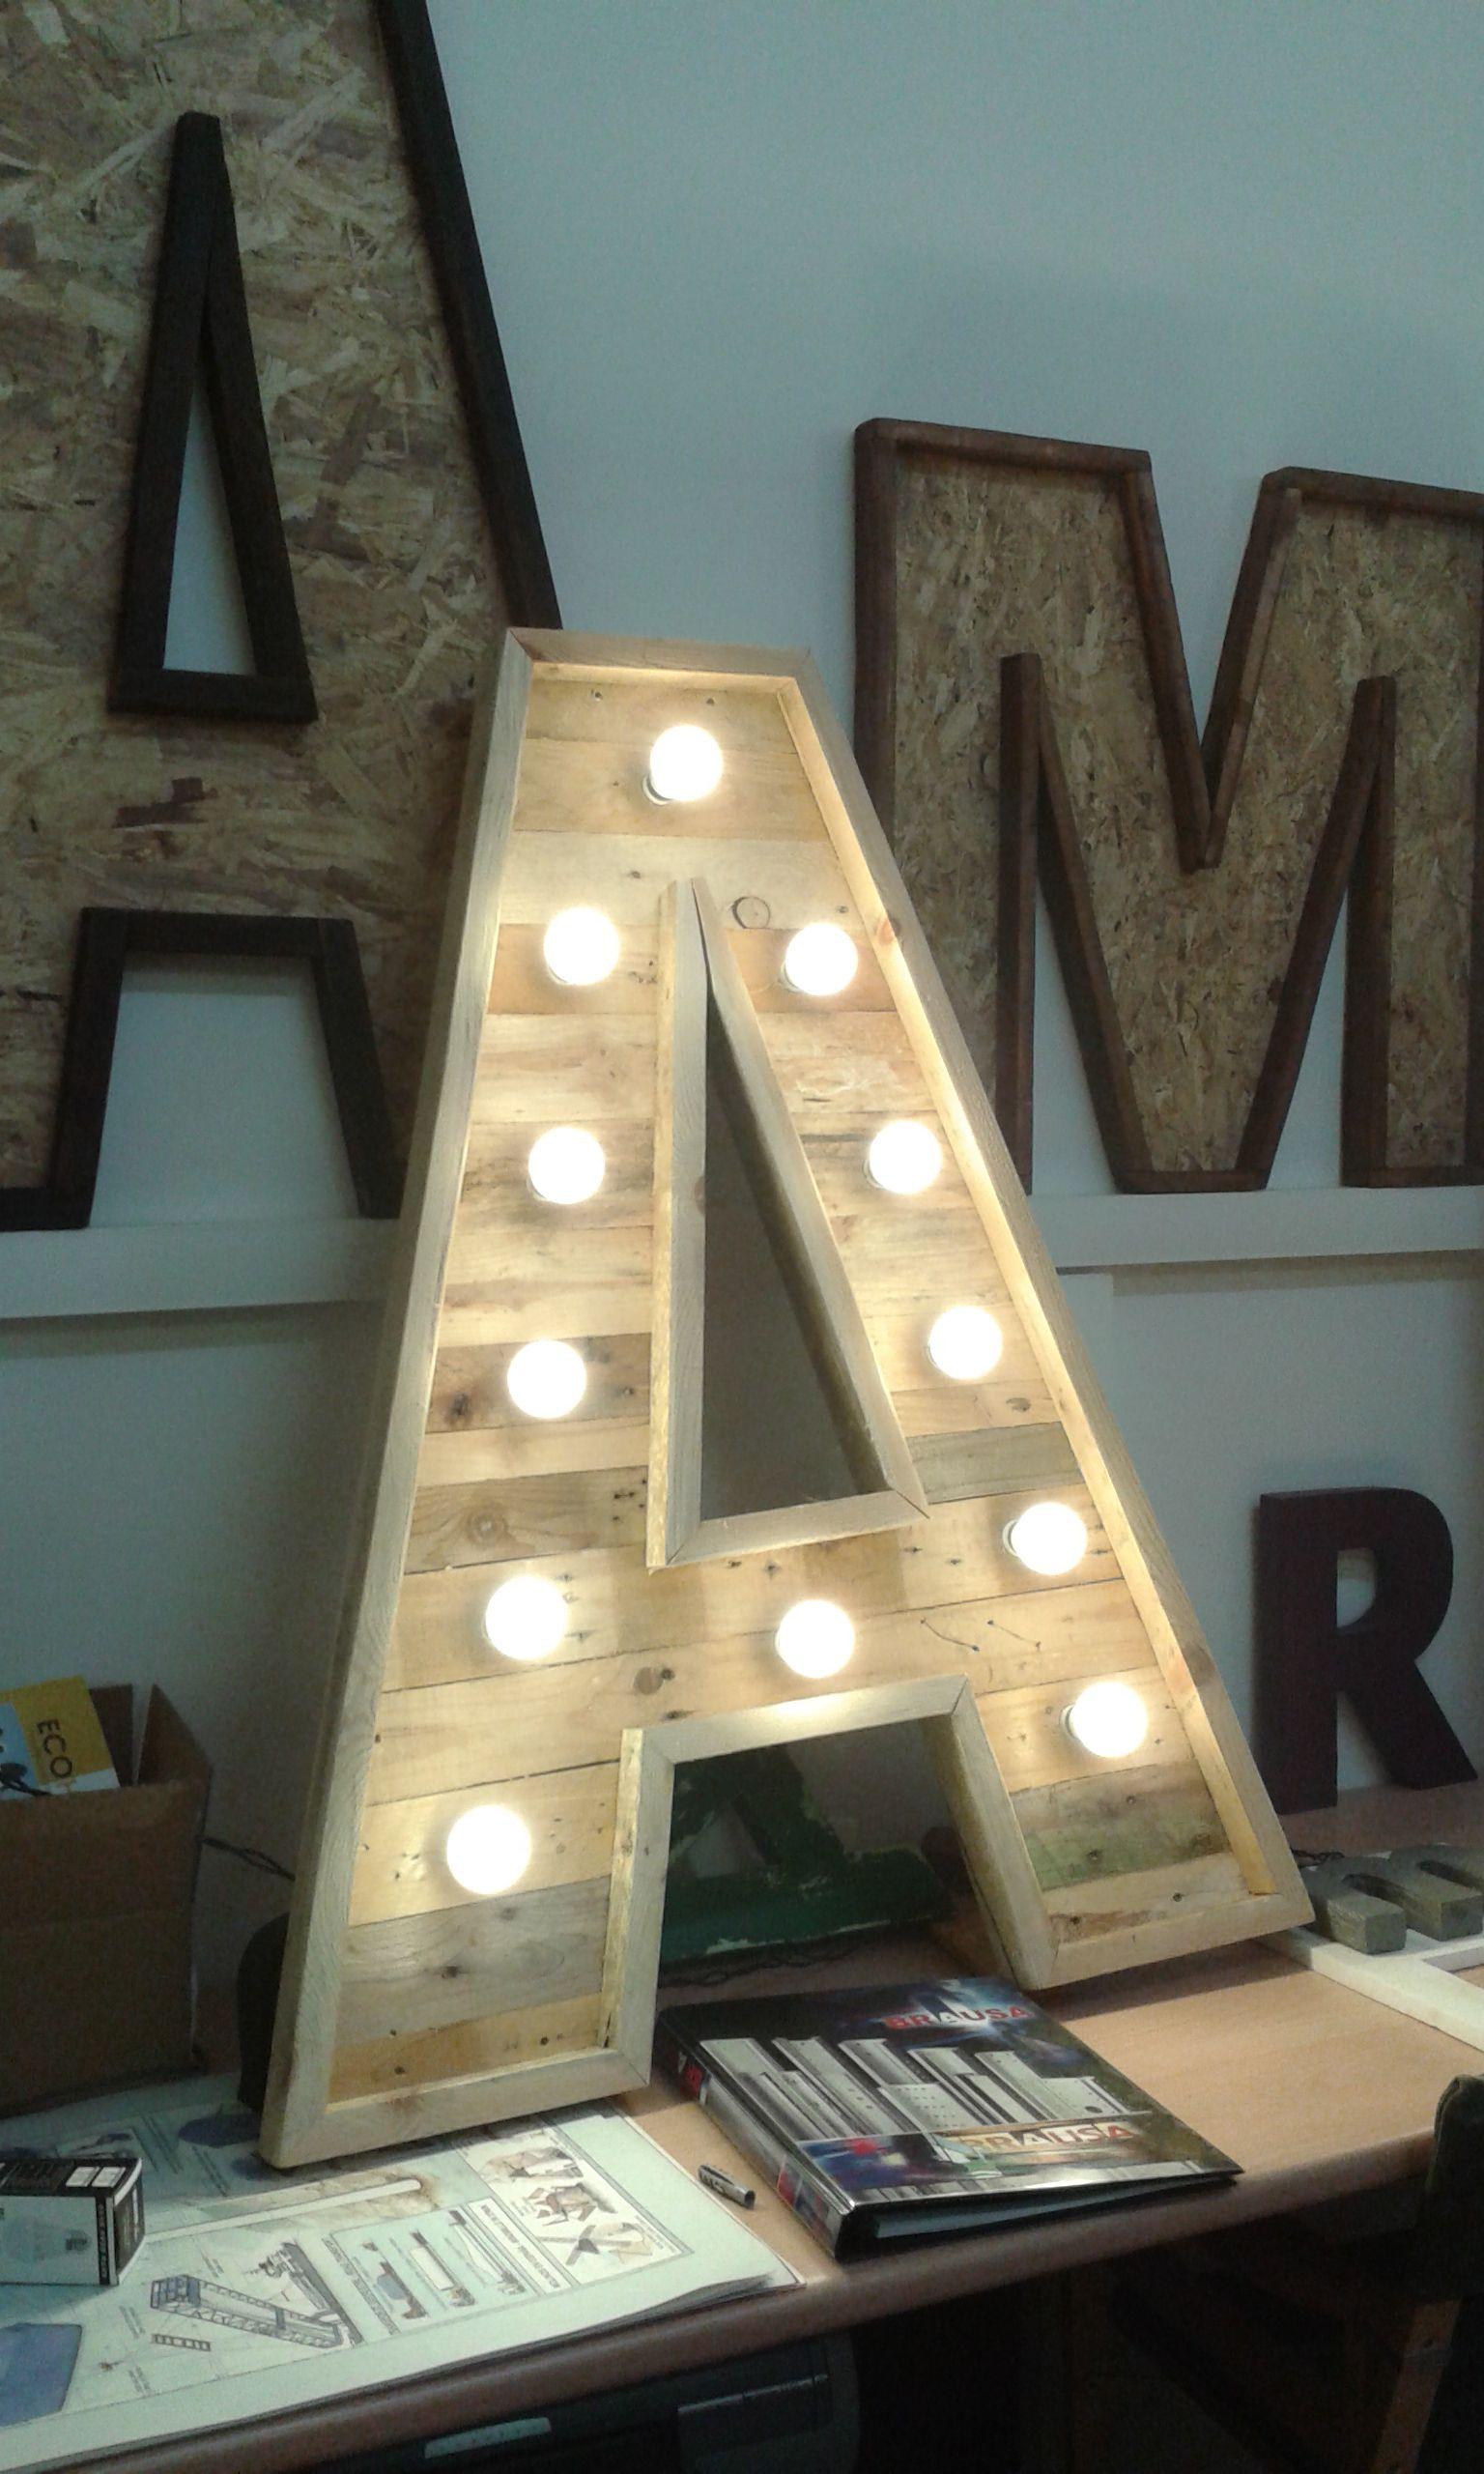 Letras luminosas especial para eventos Construidas con maderas